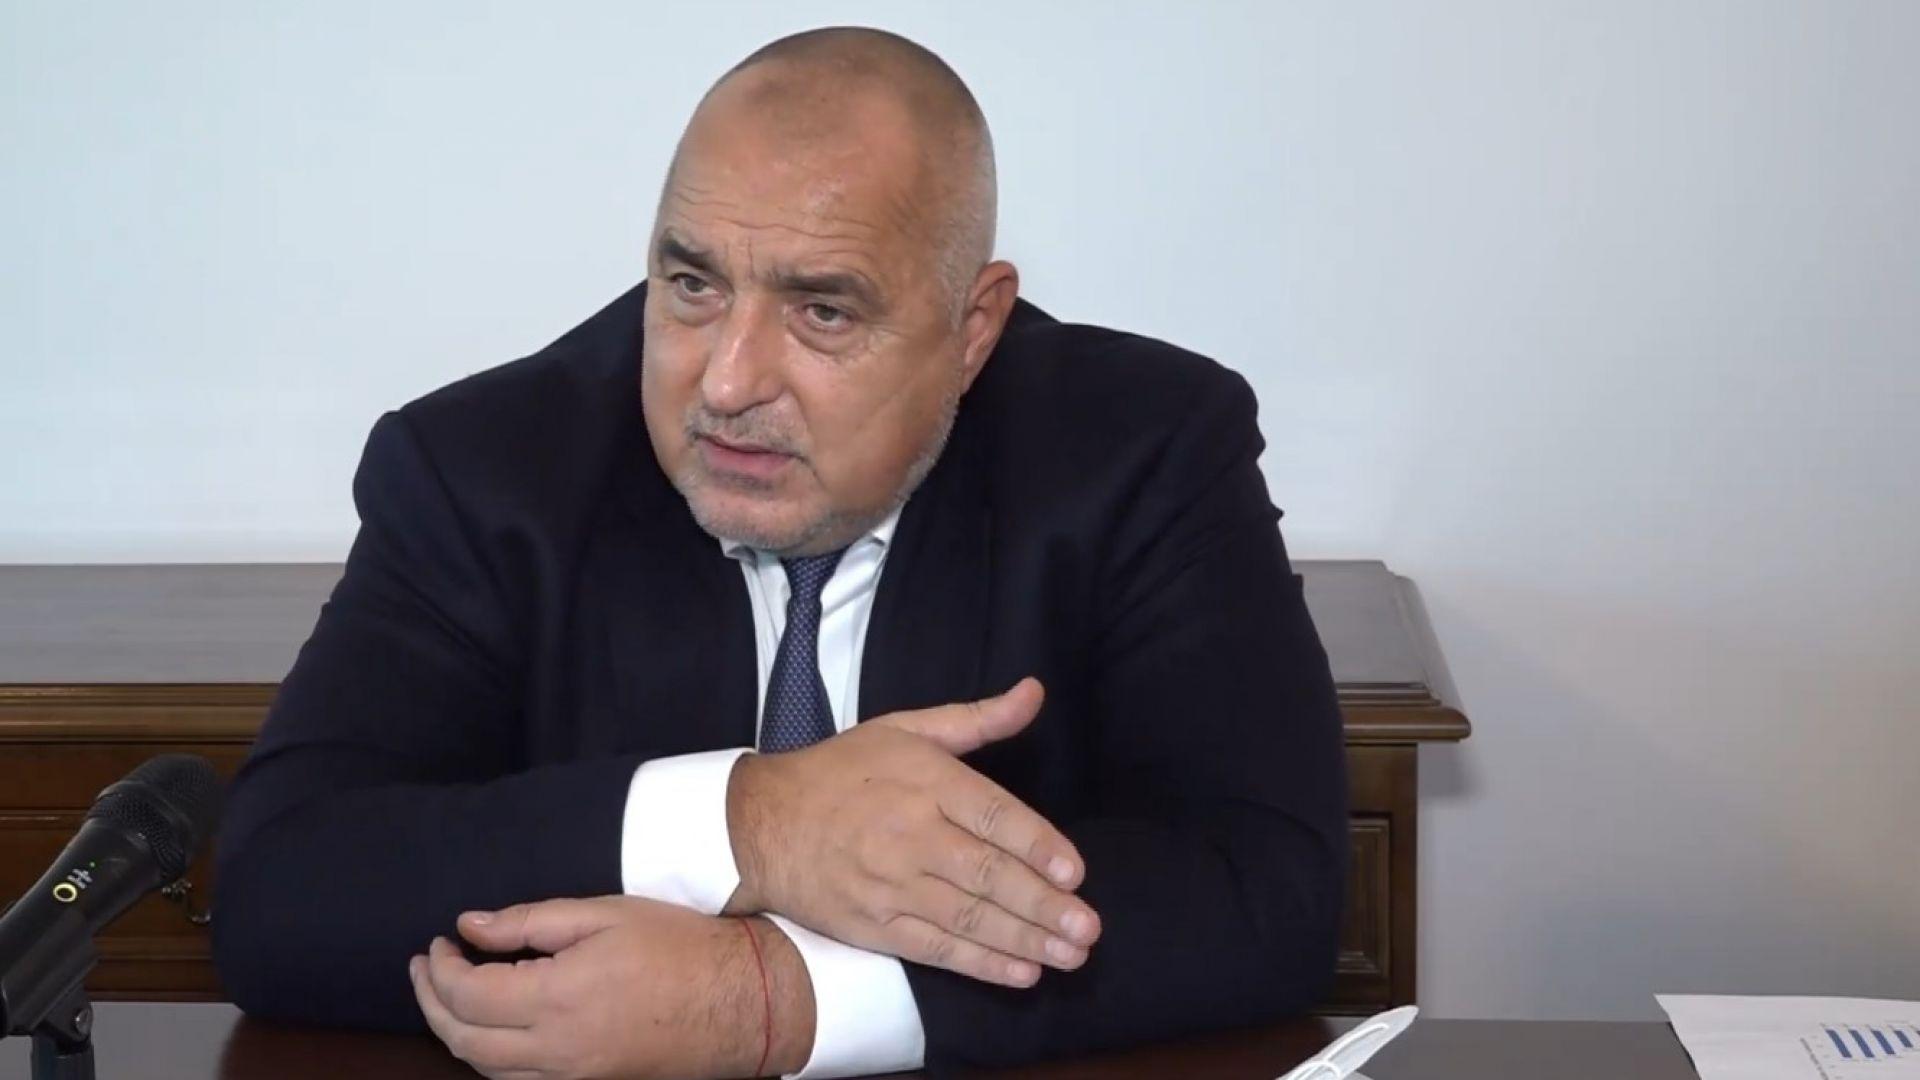 Борисов: Поредната добра оценка за страната значи, че мерките дават резултати